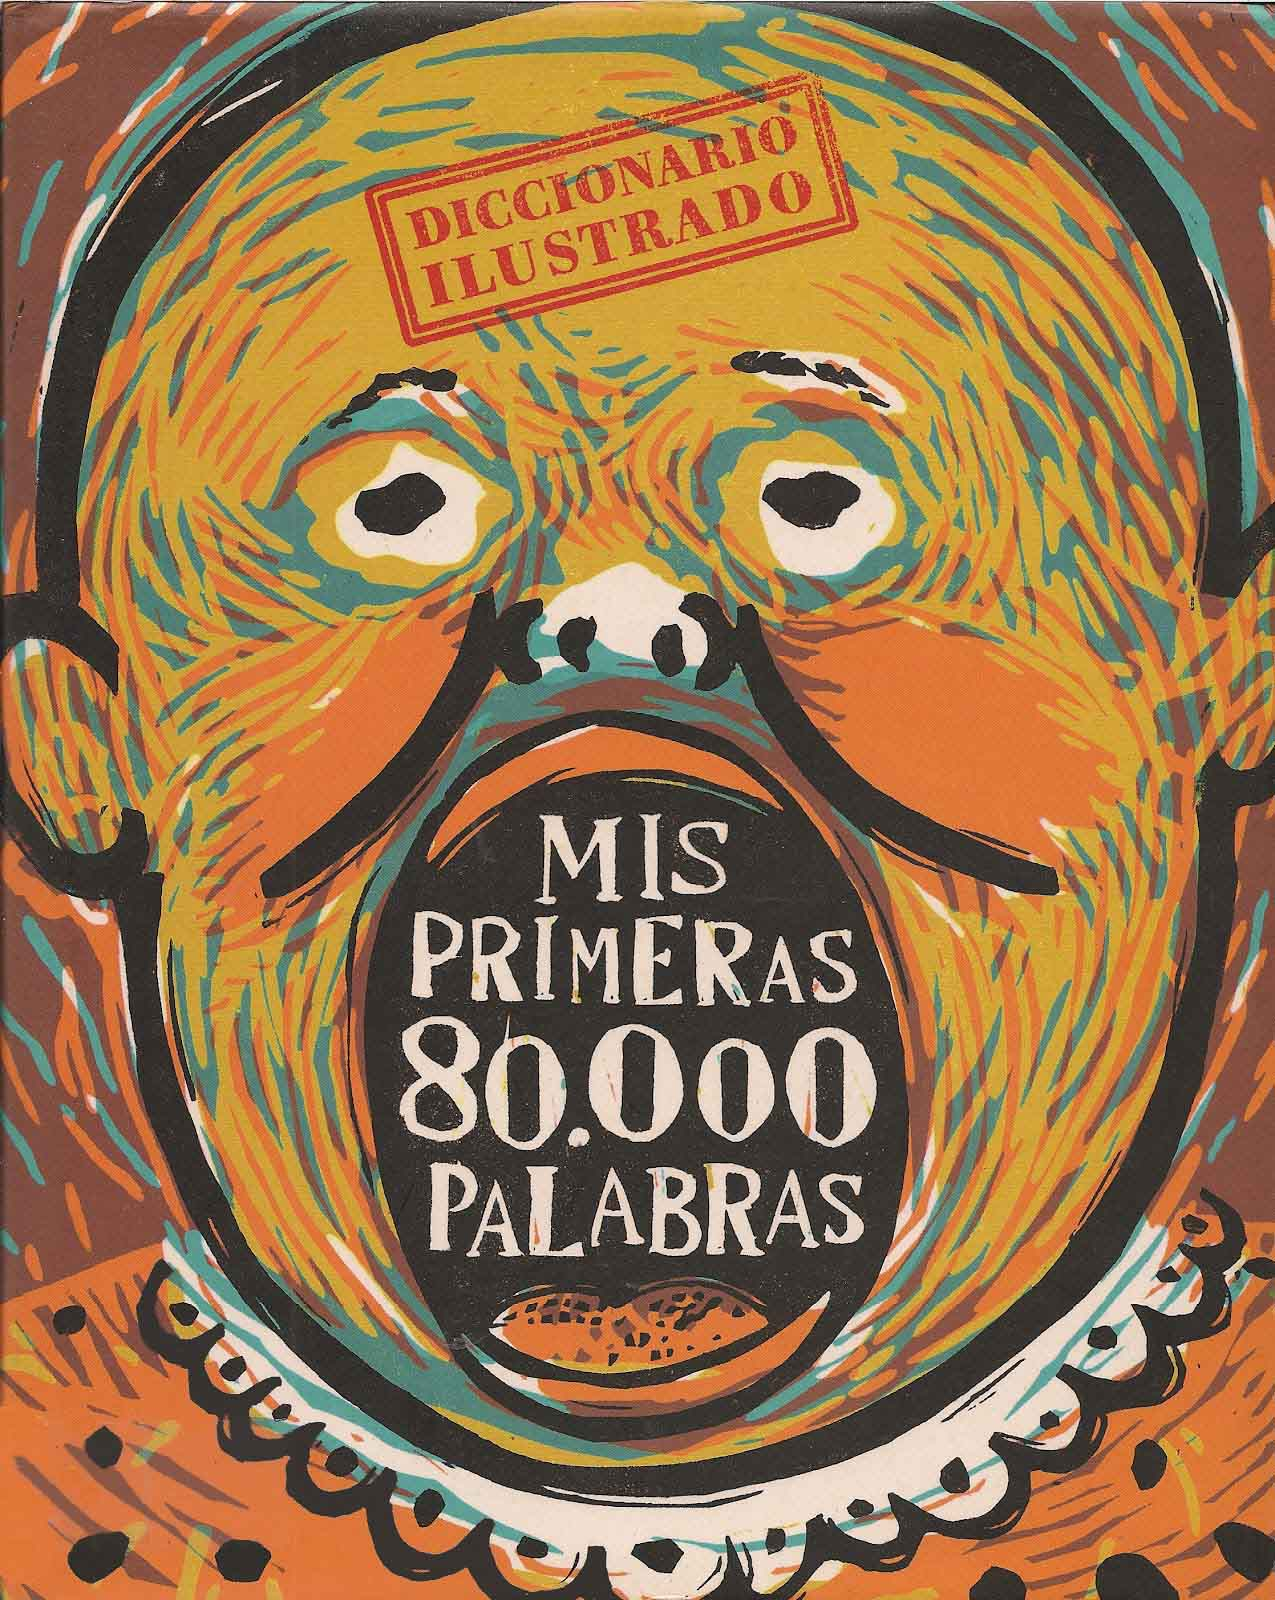 MIS PRIMERAS 80.000 PALABRAS.jpg